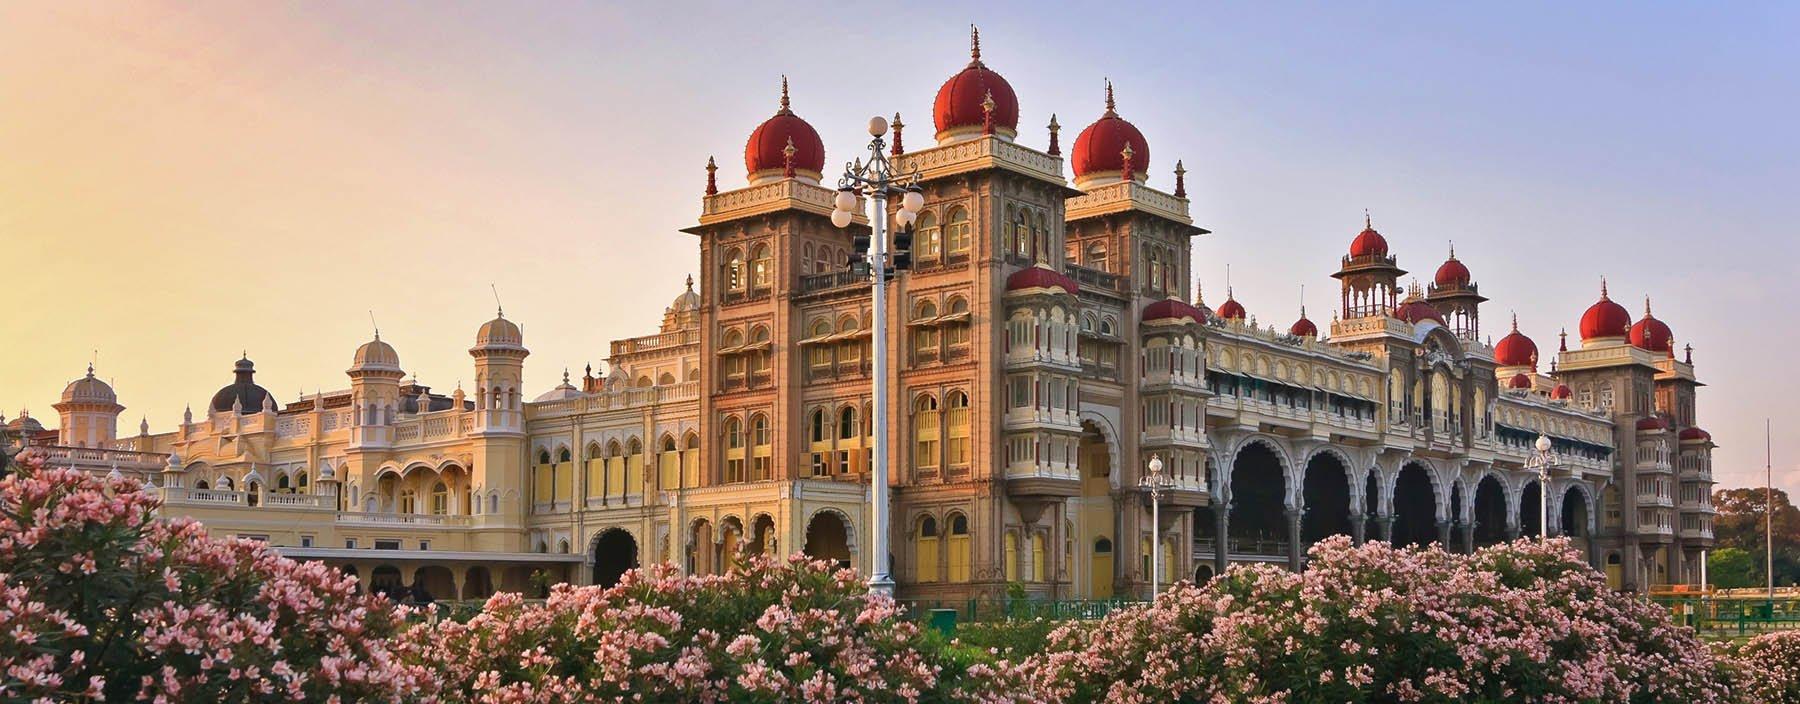 in, mysore, koninklijk paleis (2).jpg